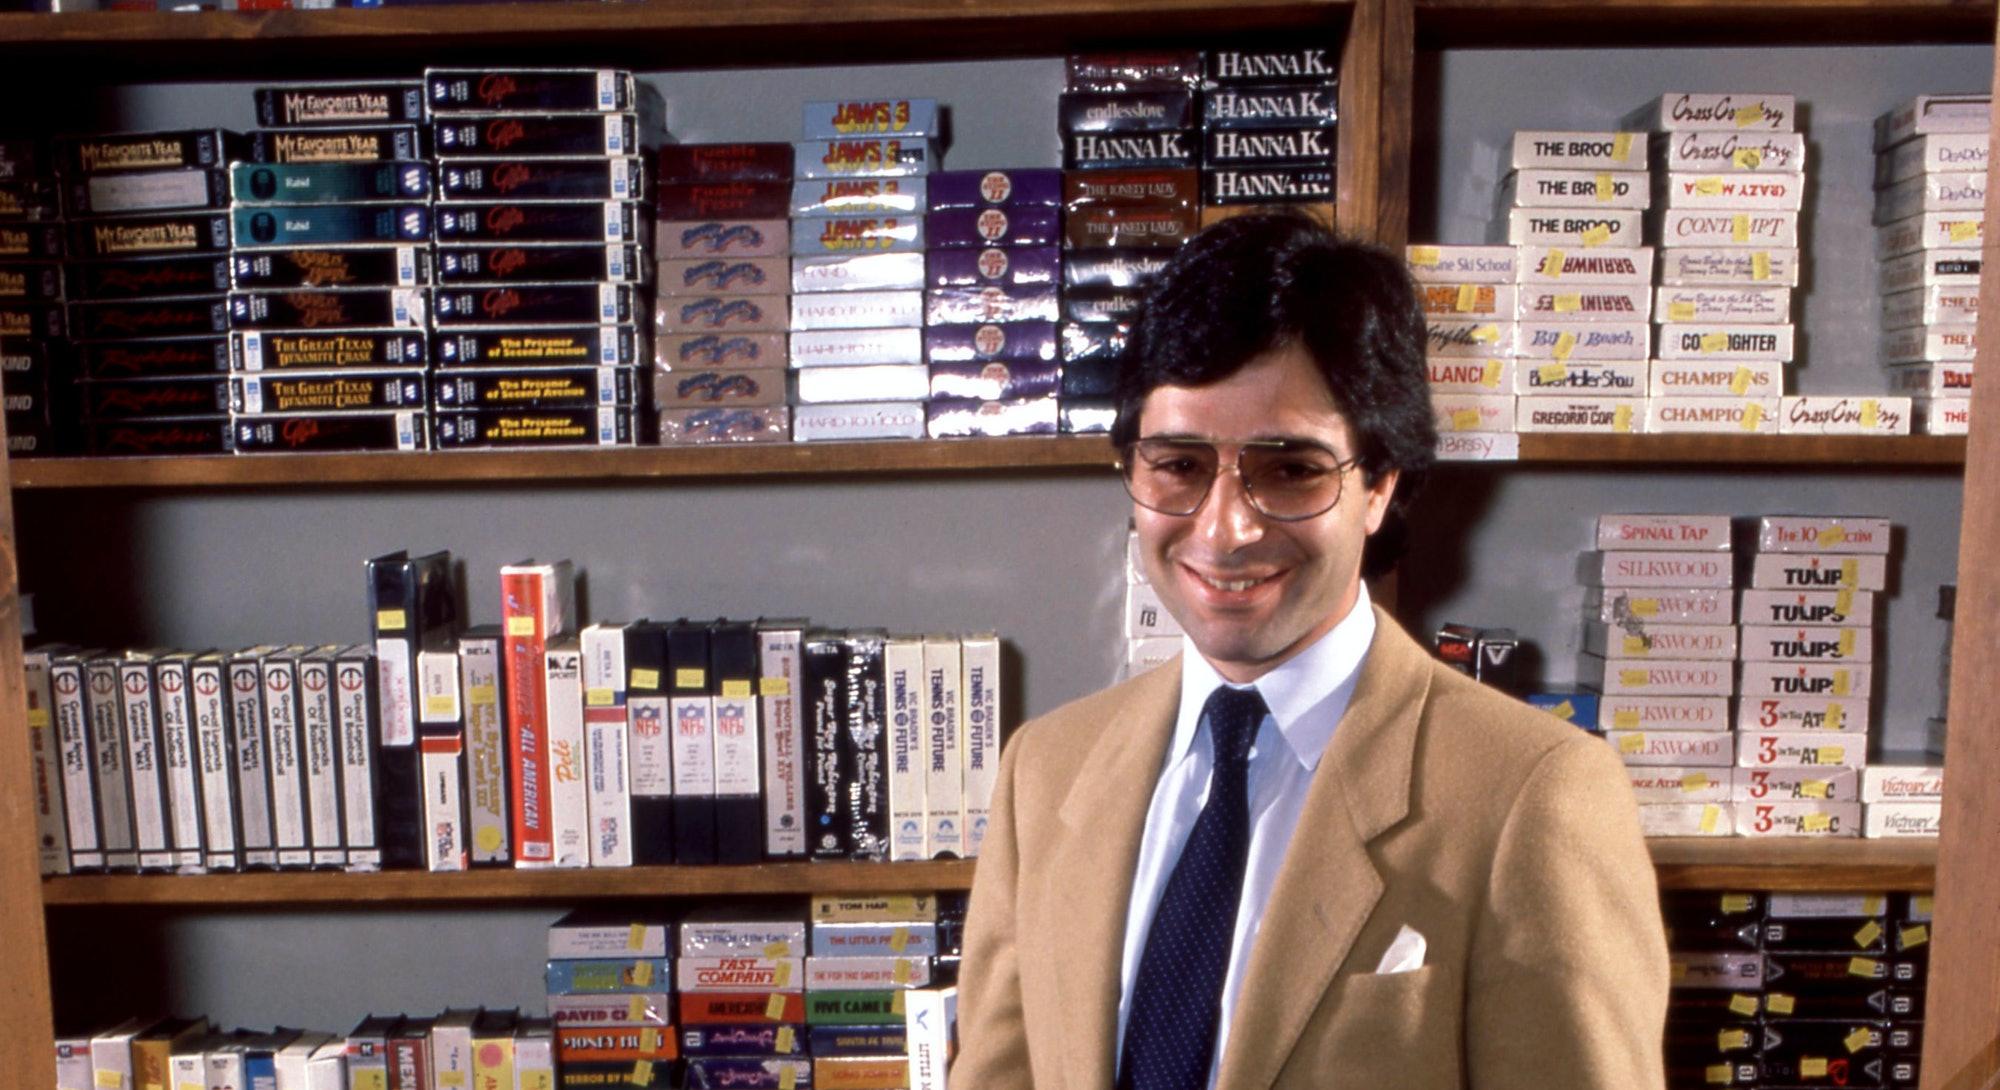 VCR VHS player shopping retro videos blockbuster